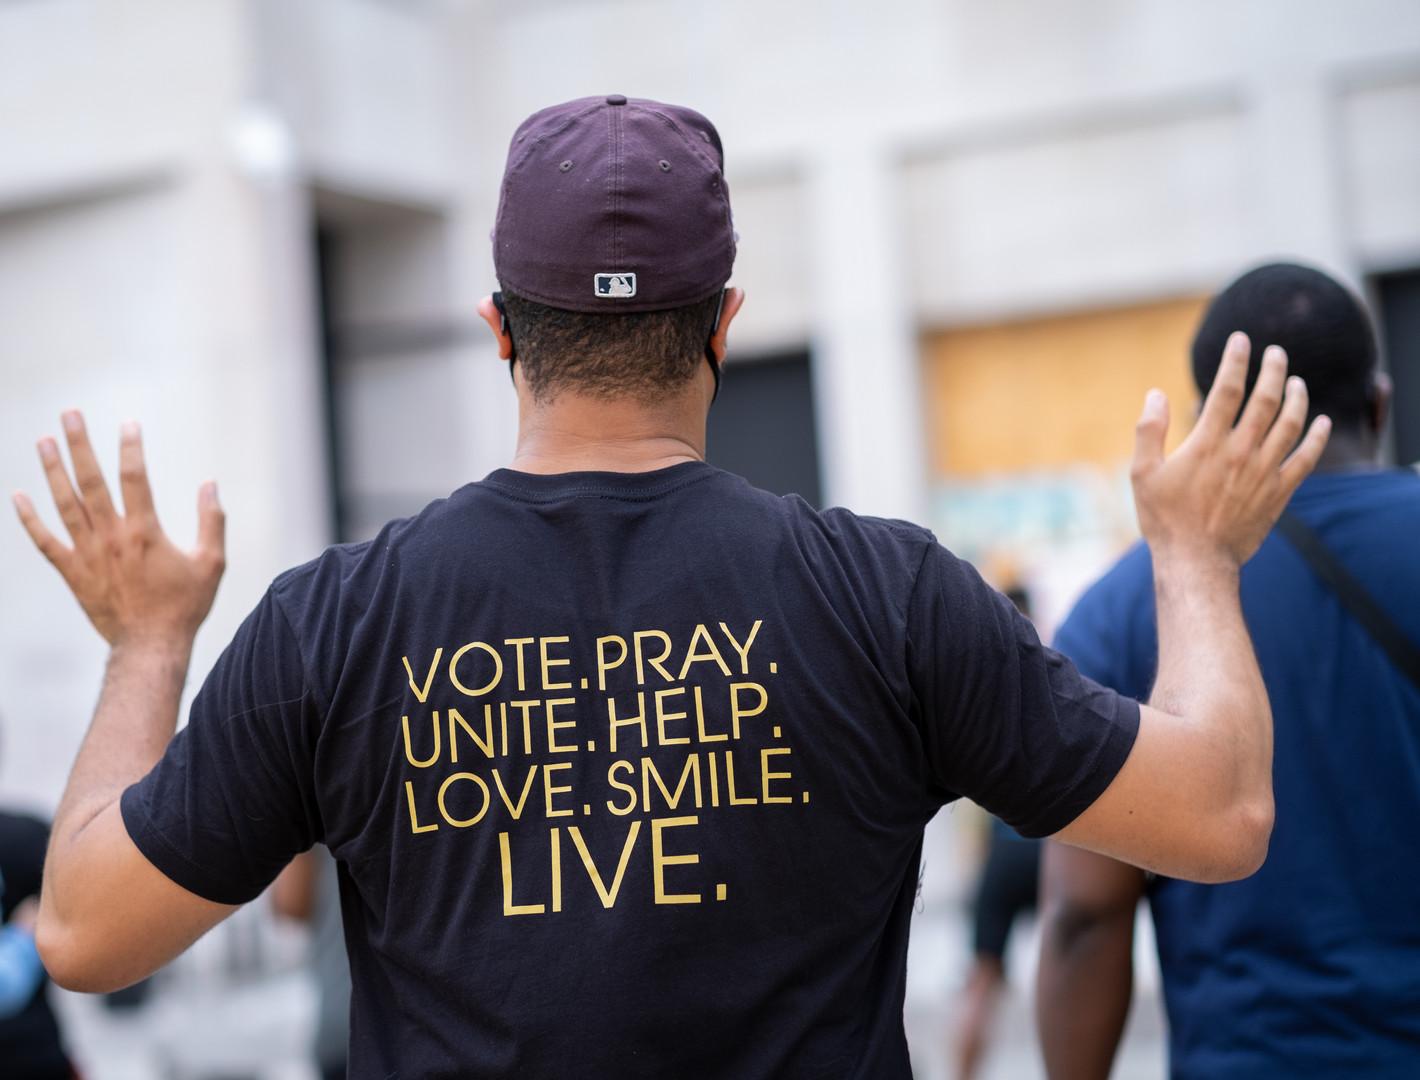 Black Lives Matter Plaza, DC 2020